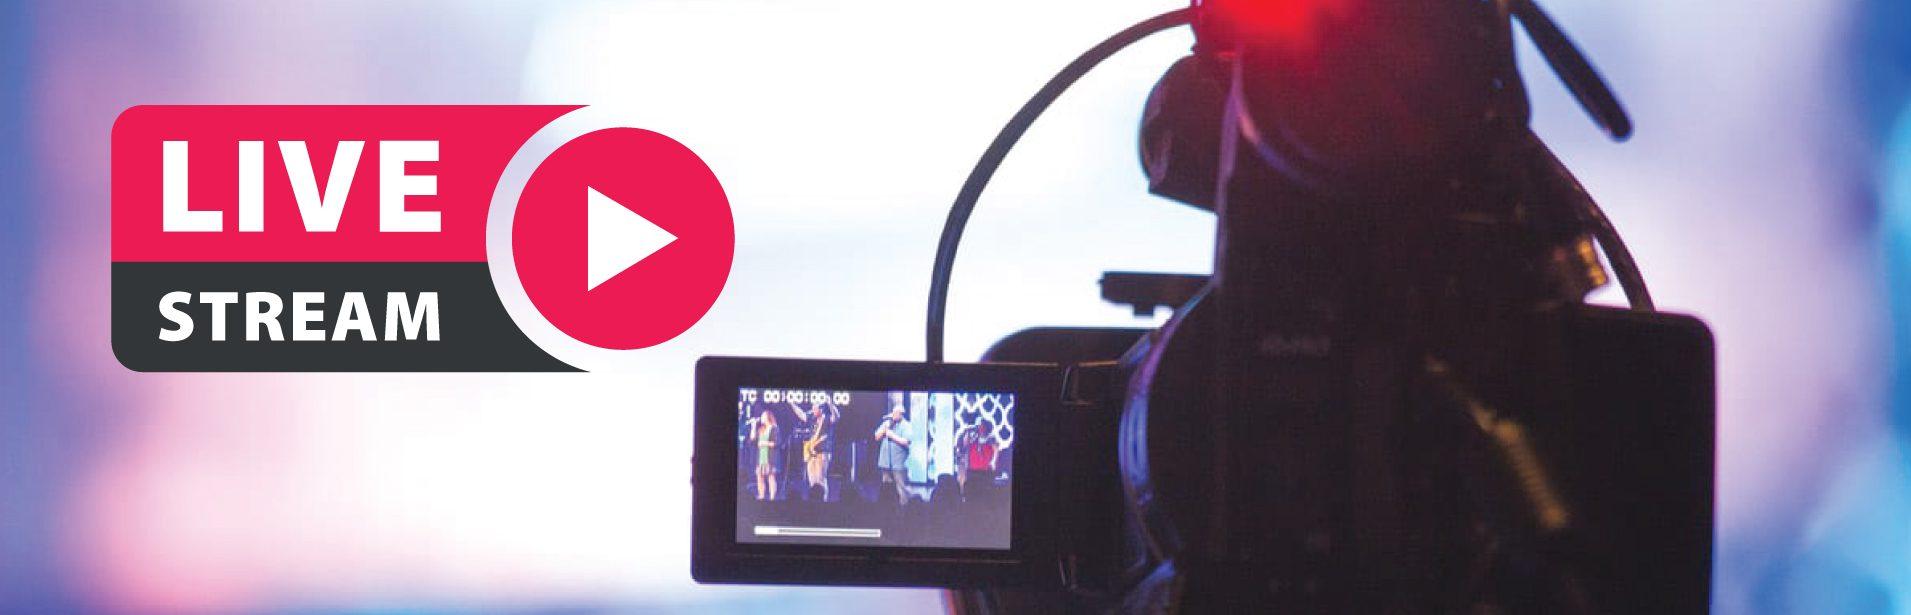 livestream-mount-hope-crc-church-good